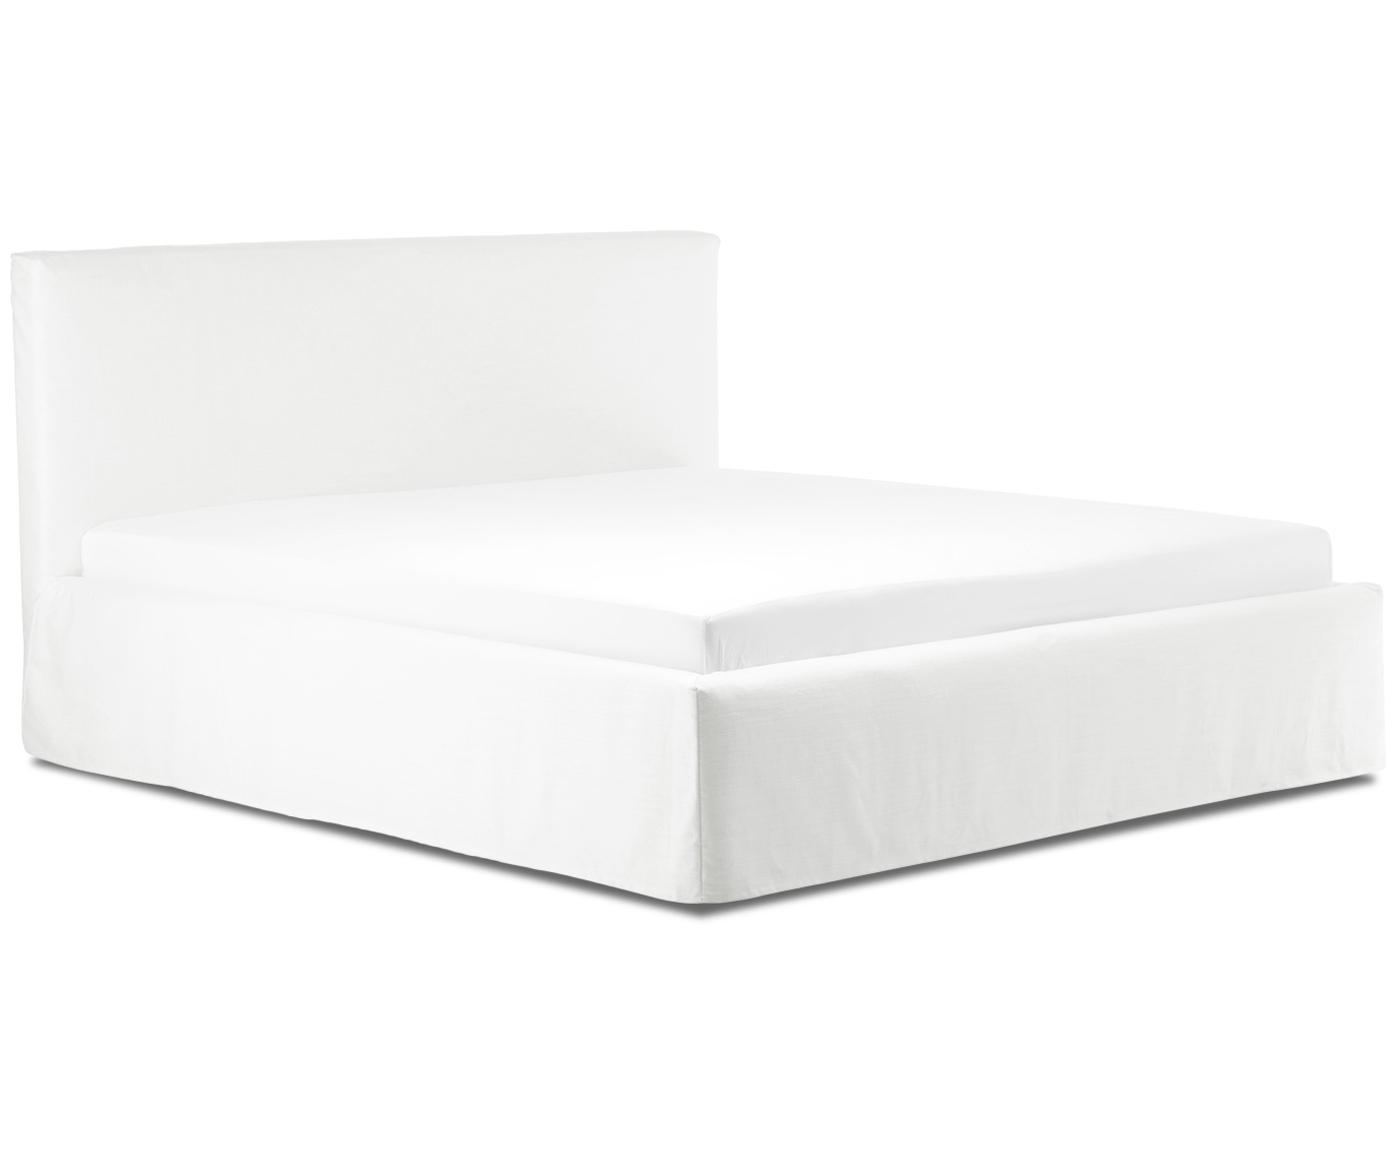 Gestoffeerd bed Feather met opbergfunctie, Frame: massief grenenhout, Bekleding: polyester (structuurmater, Crèmewit, 140 x 200 cm